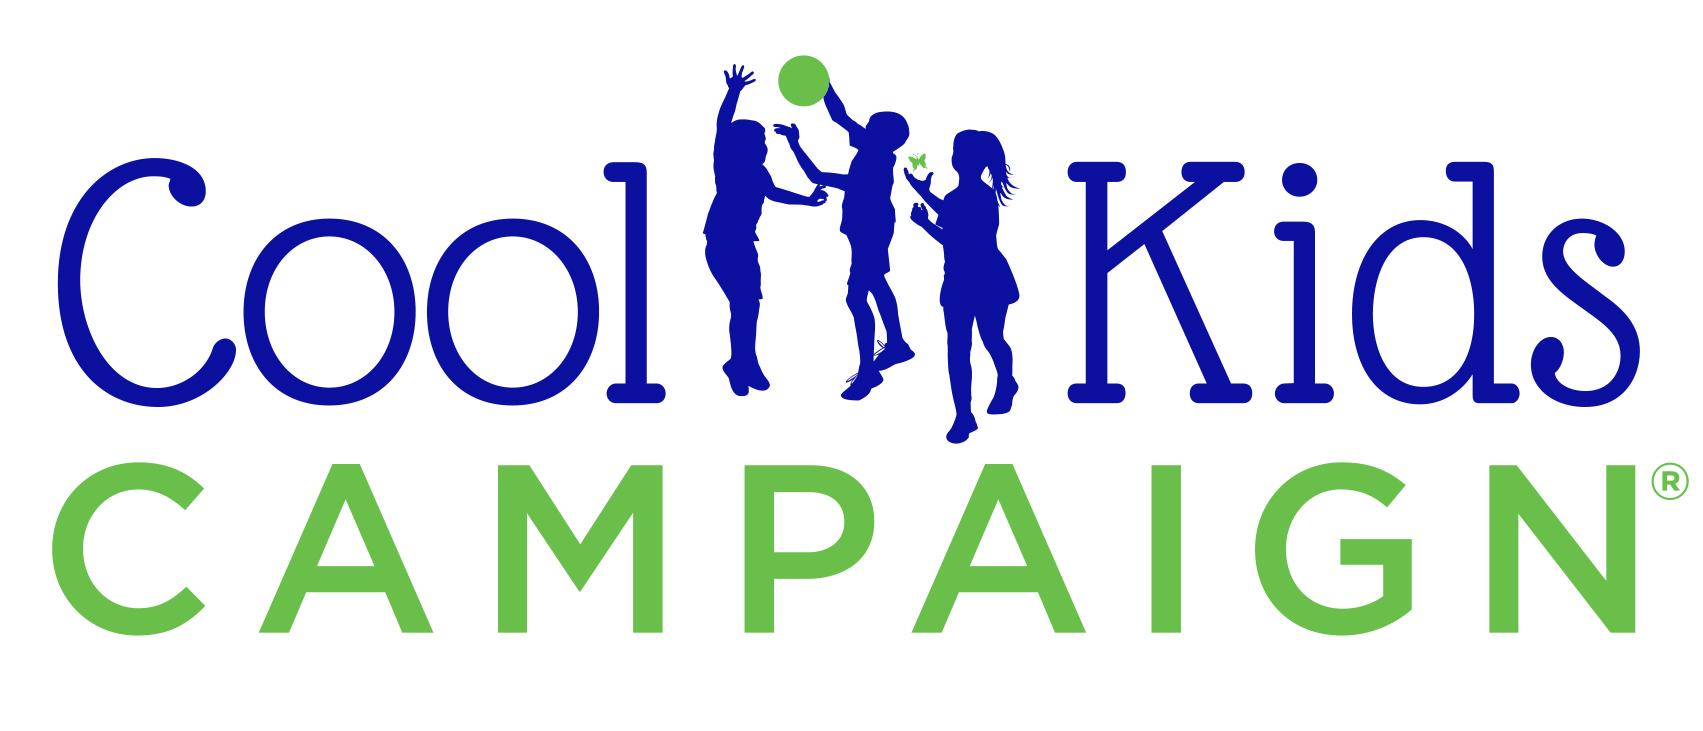 Cool Kid Campaign logo